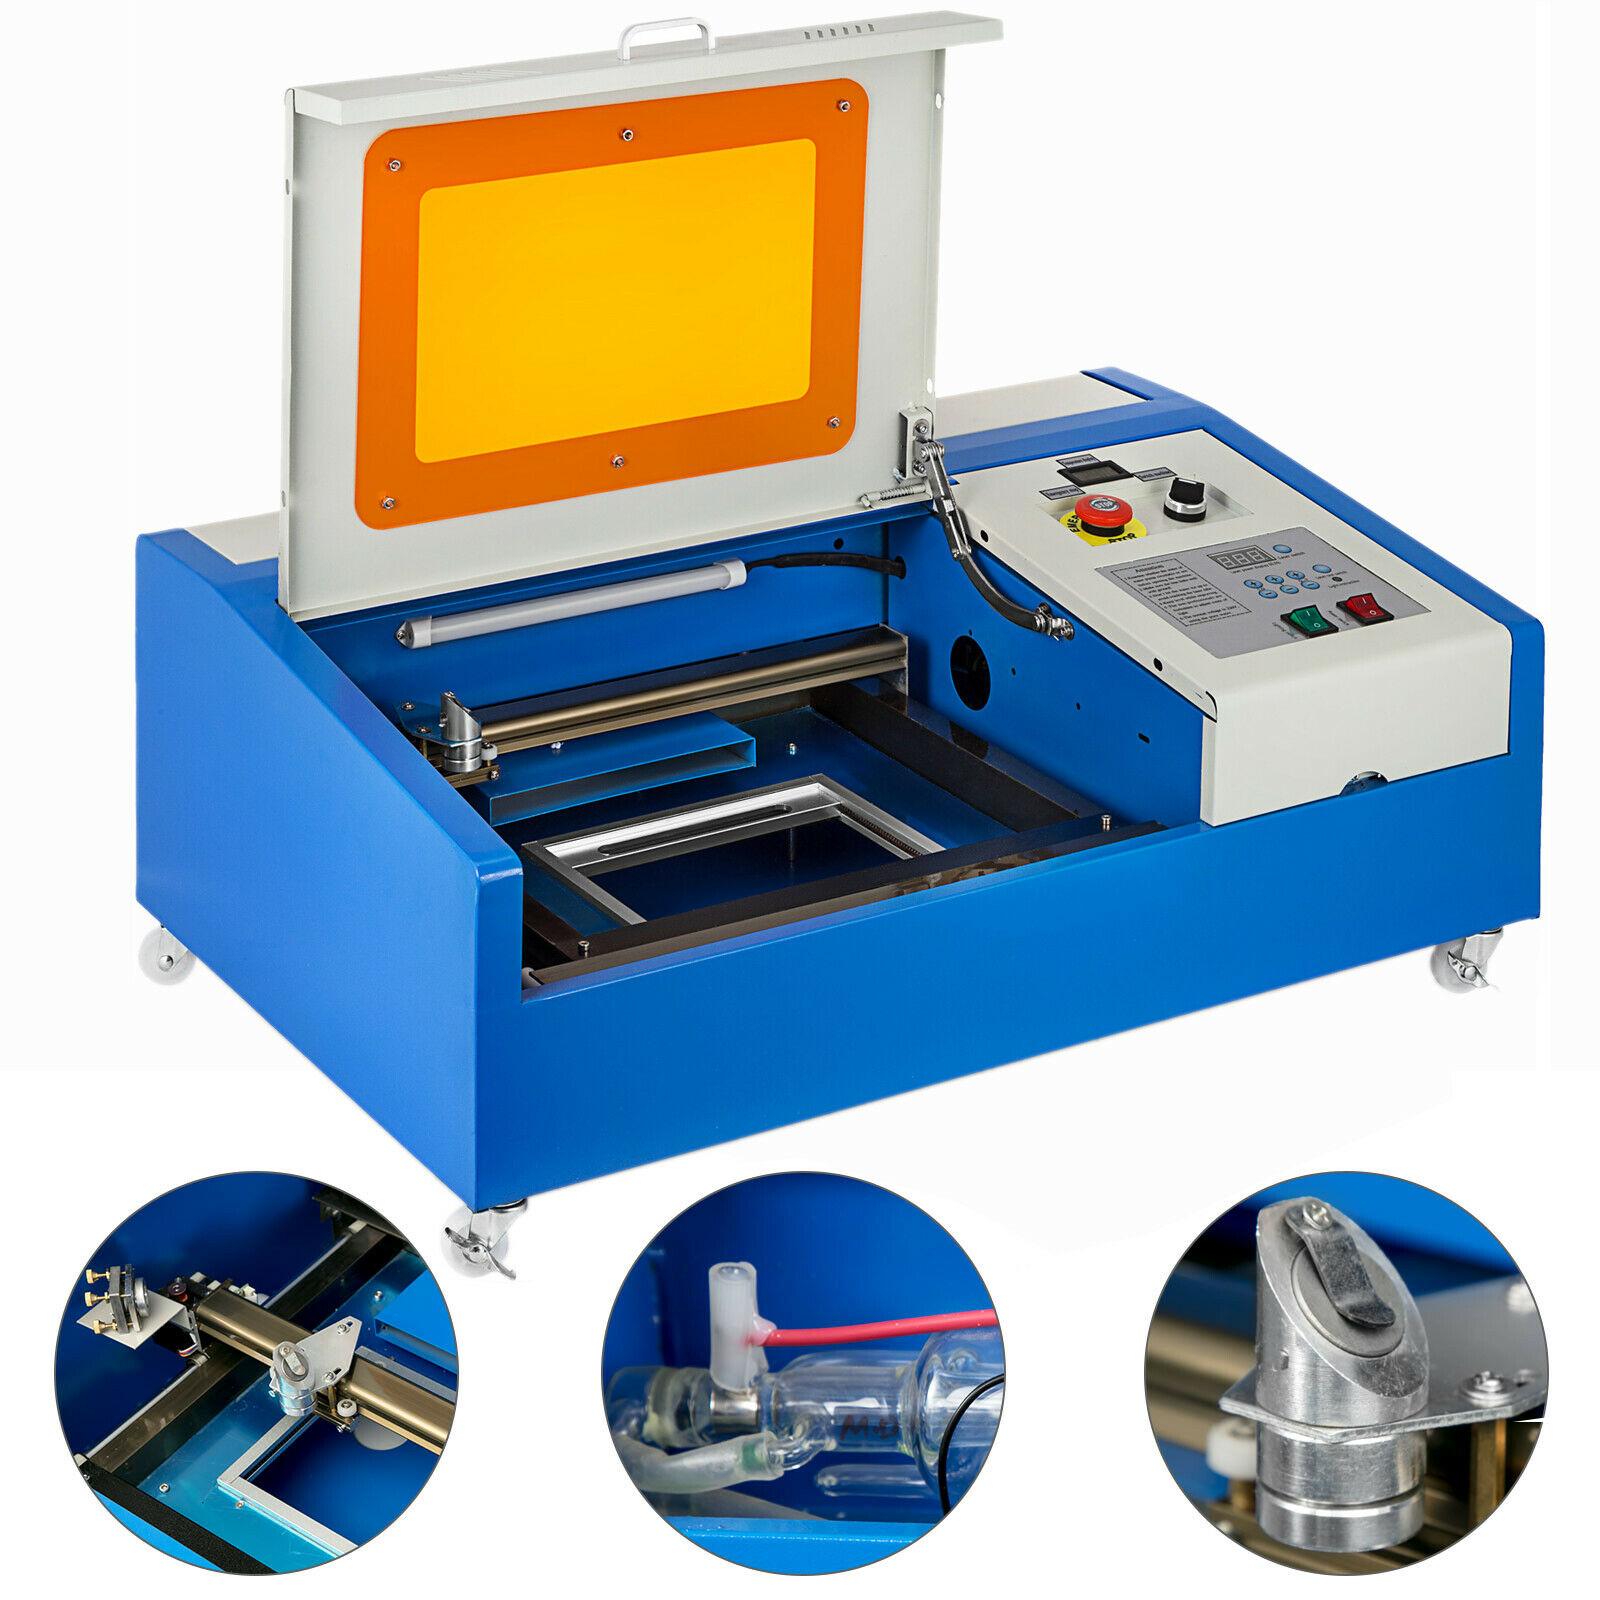 200*300mm Mini Laser Engraving Machine 40W Laser Cutter CO2 Laser Engraver Machine